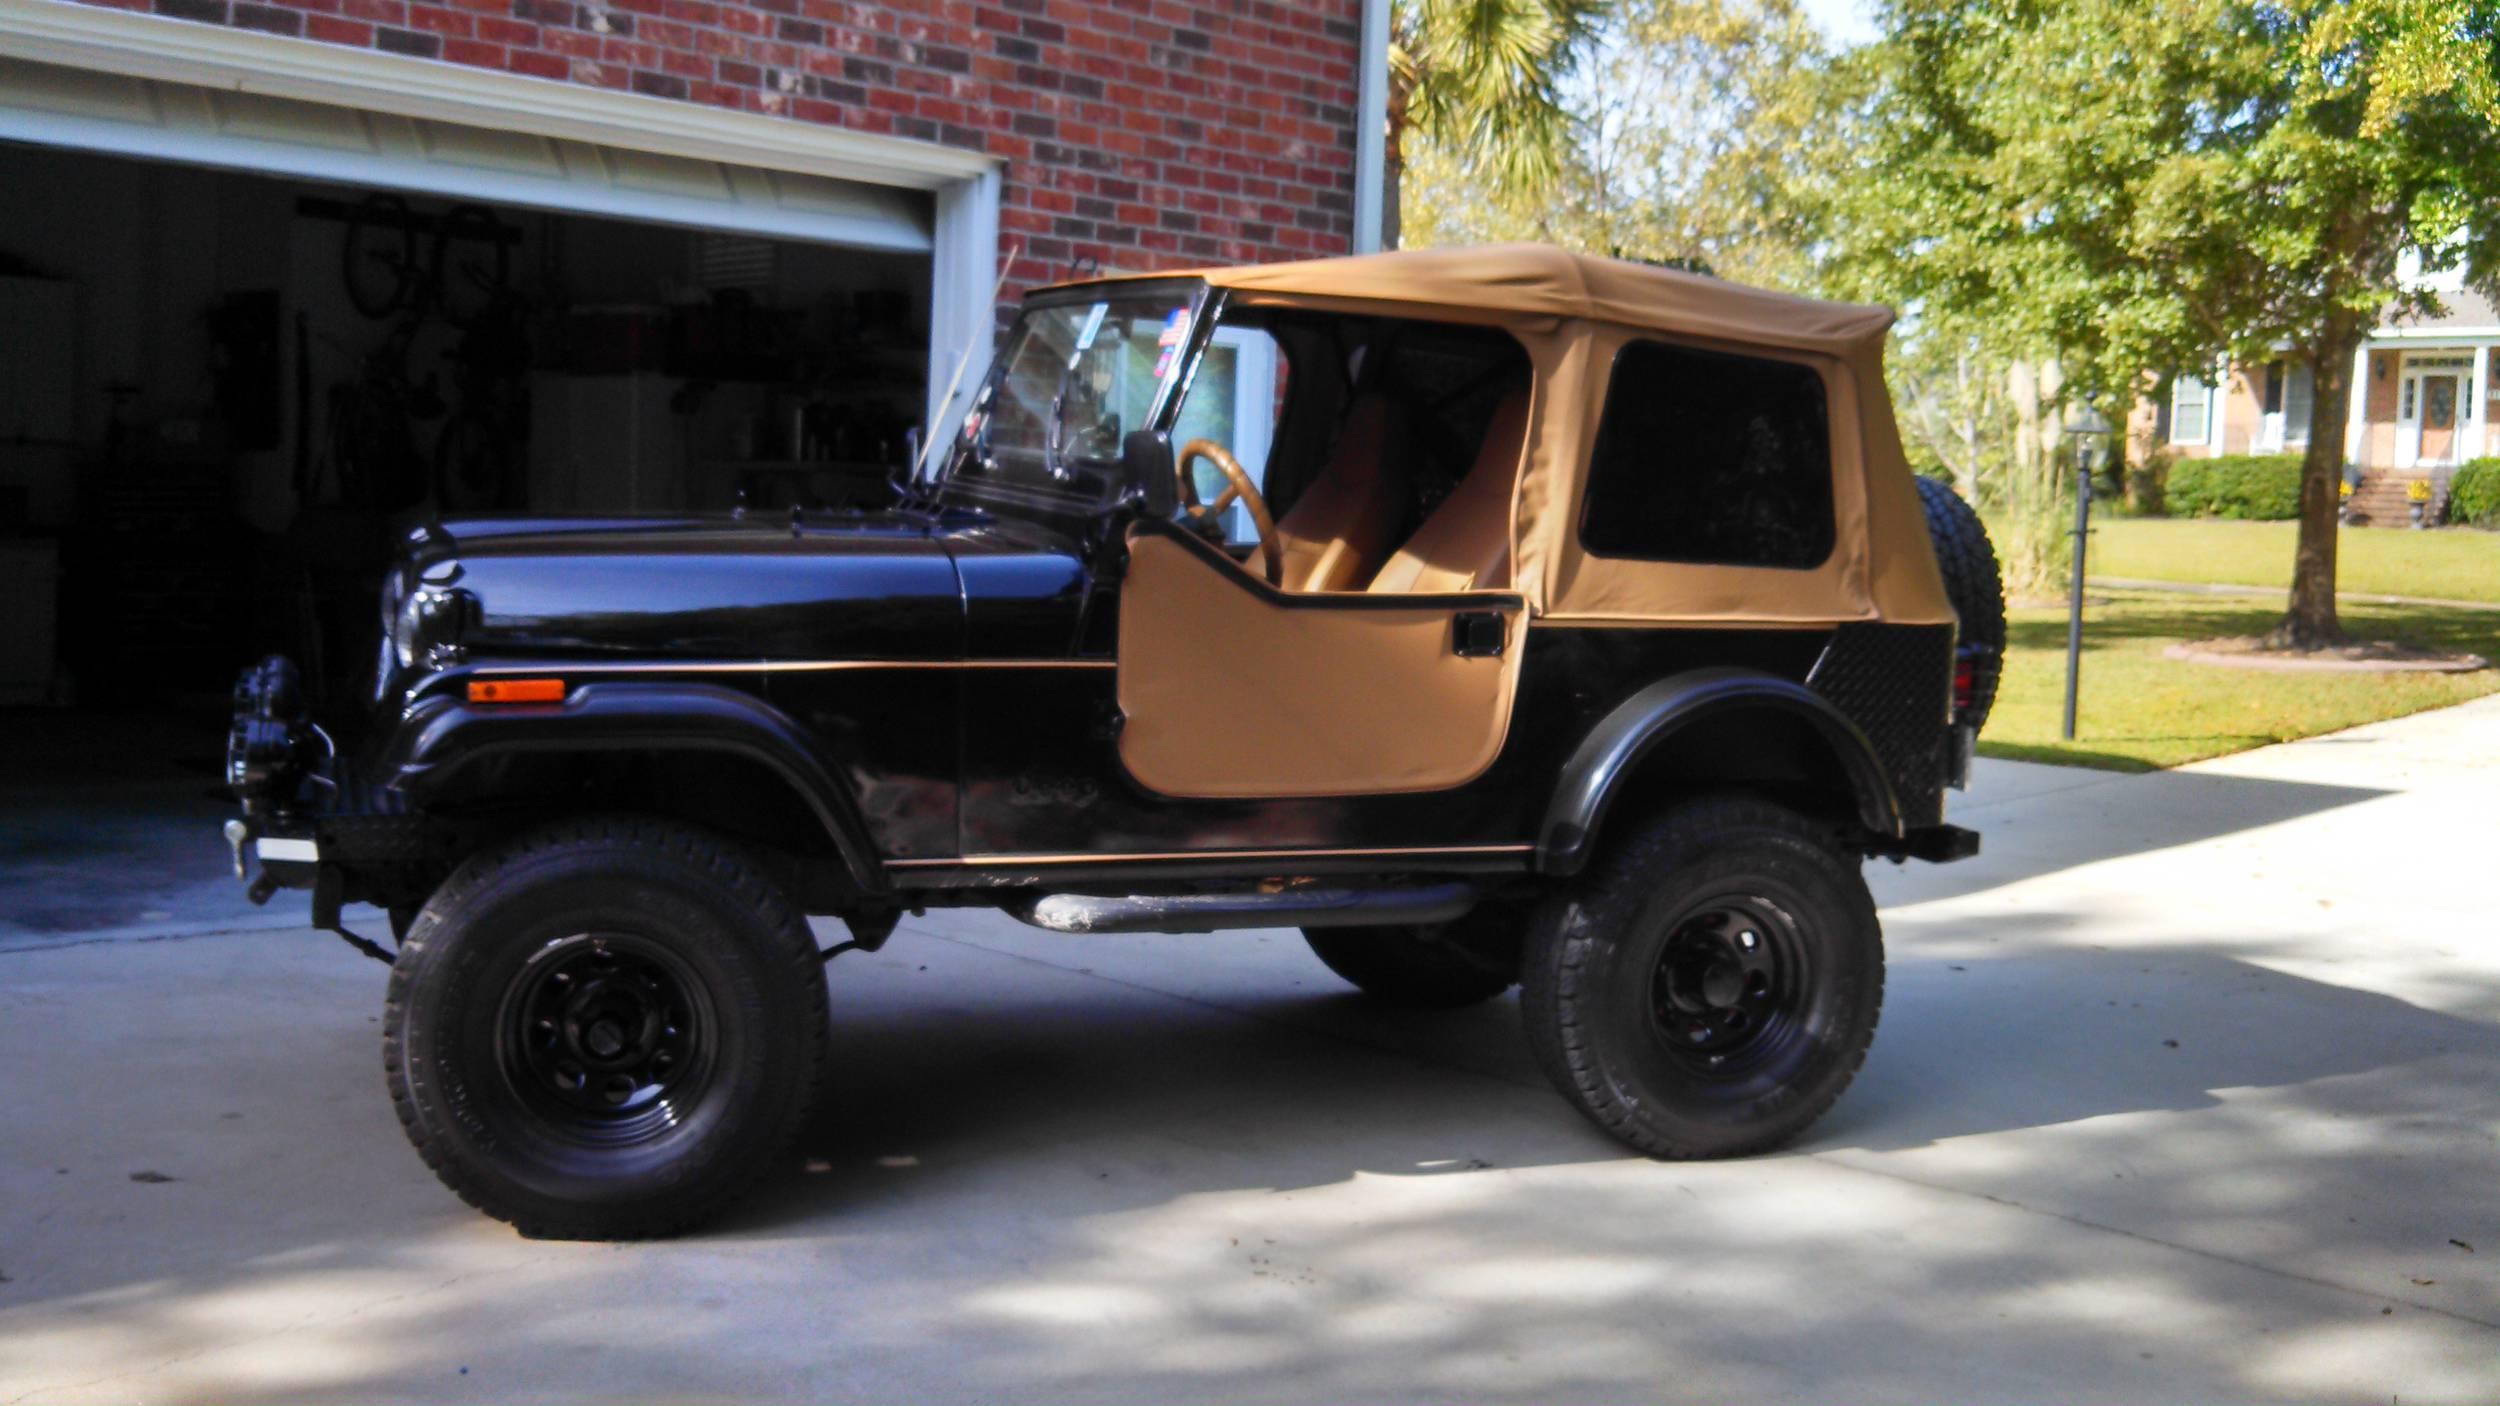 My 1983 CJ-7